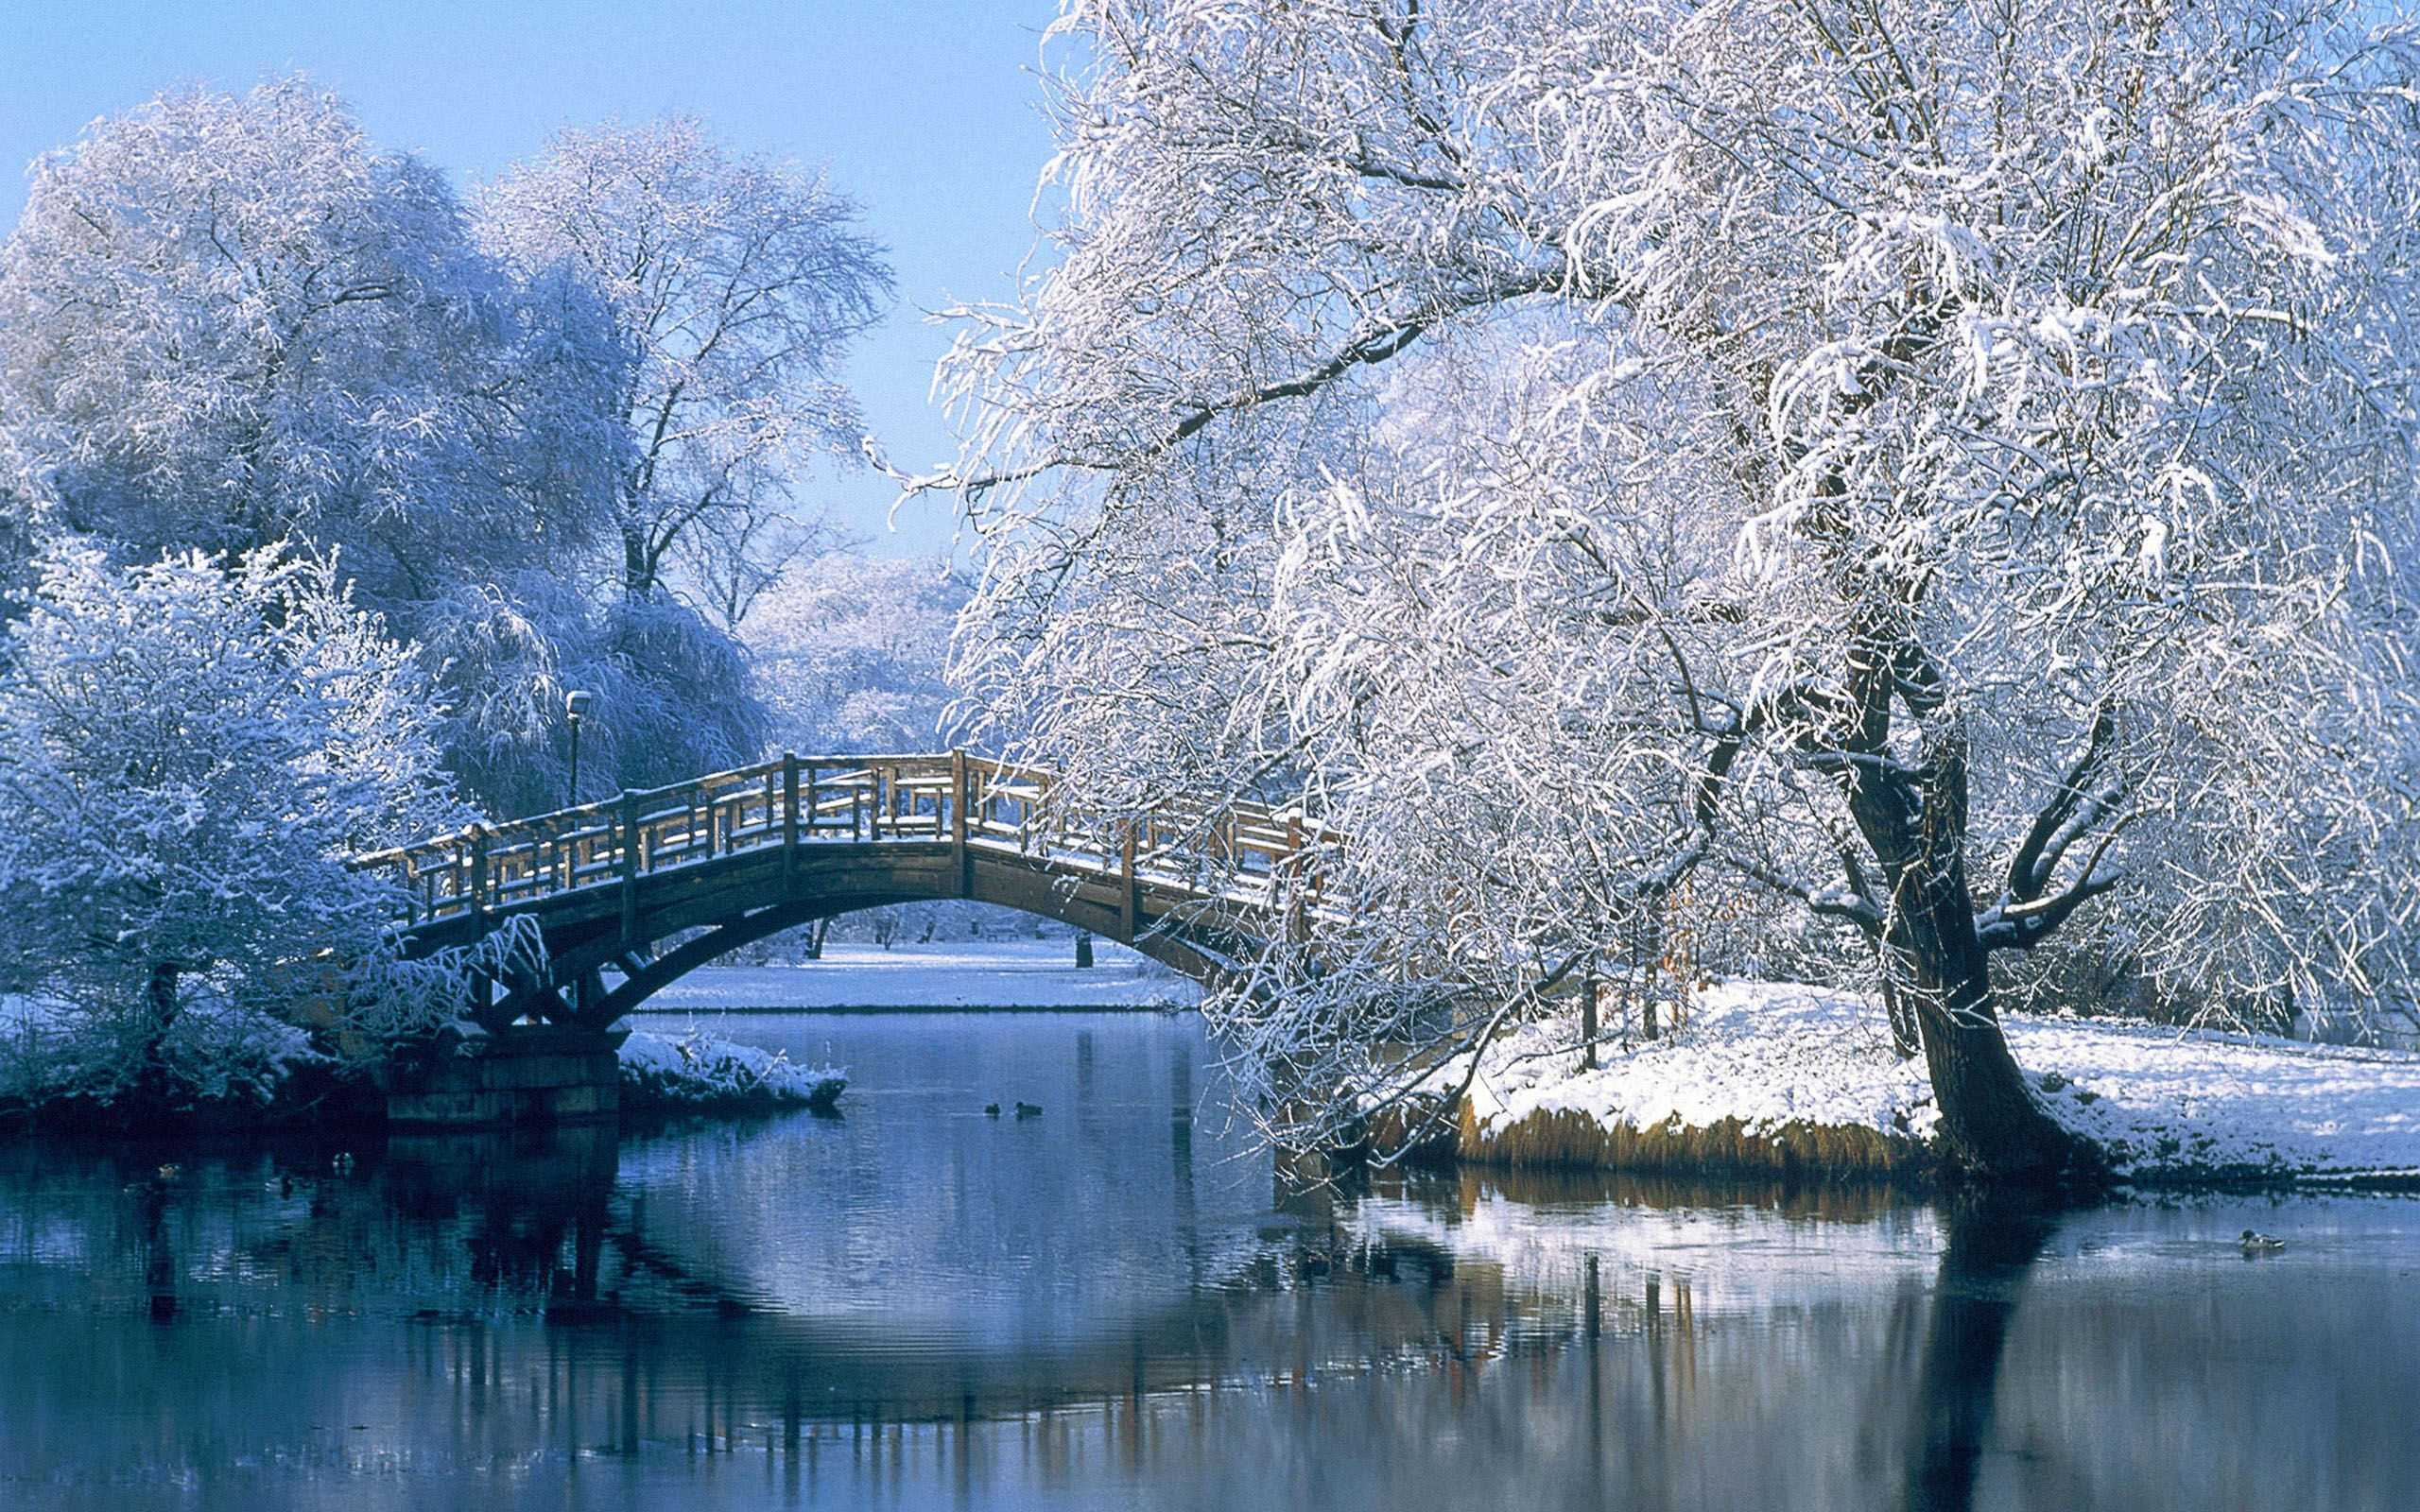 Pix For Winter In Japan Wallpaper Wallpaper Musim Dingin Pemandangan Musim Dingin Wallpaper Alam